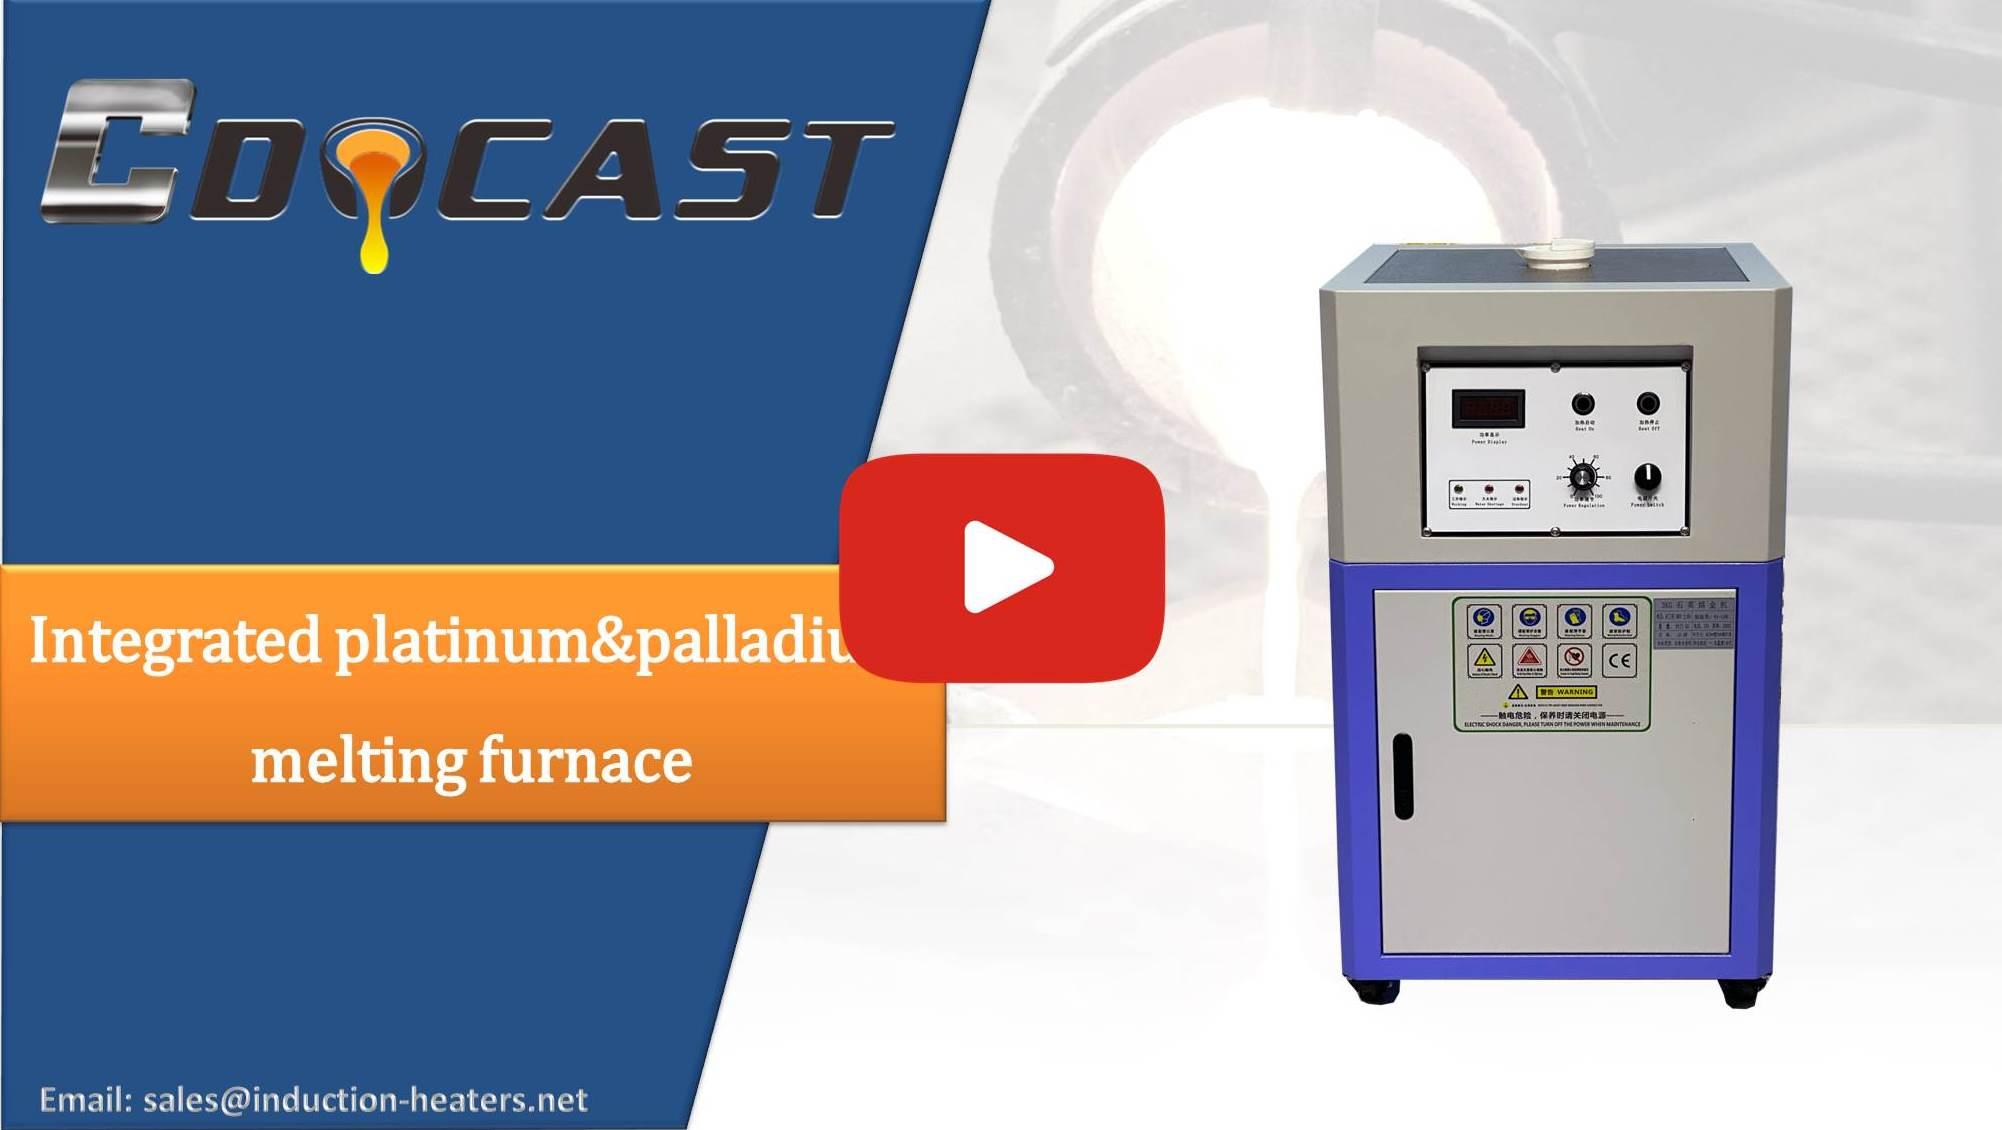 1-15kg integrated platinum&palladium melting furnace